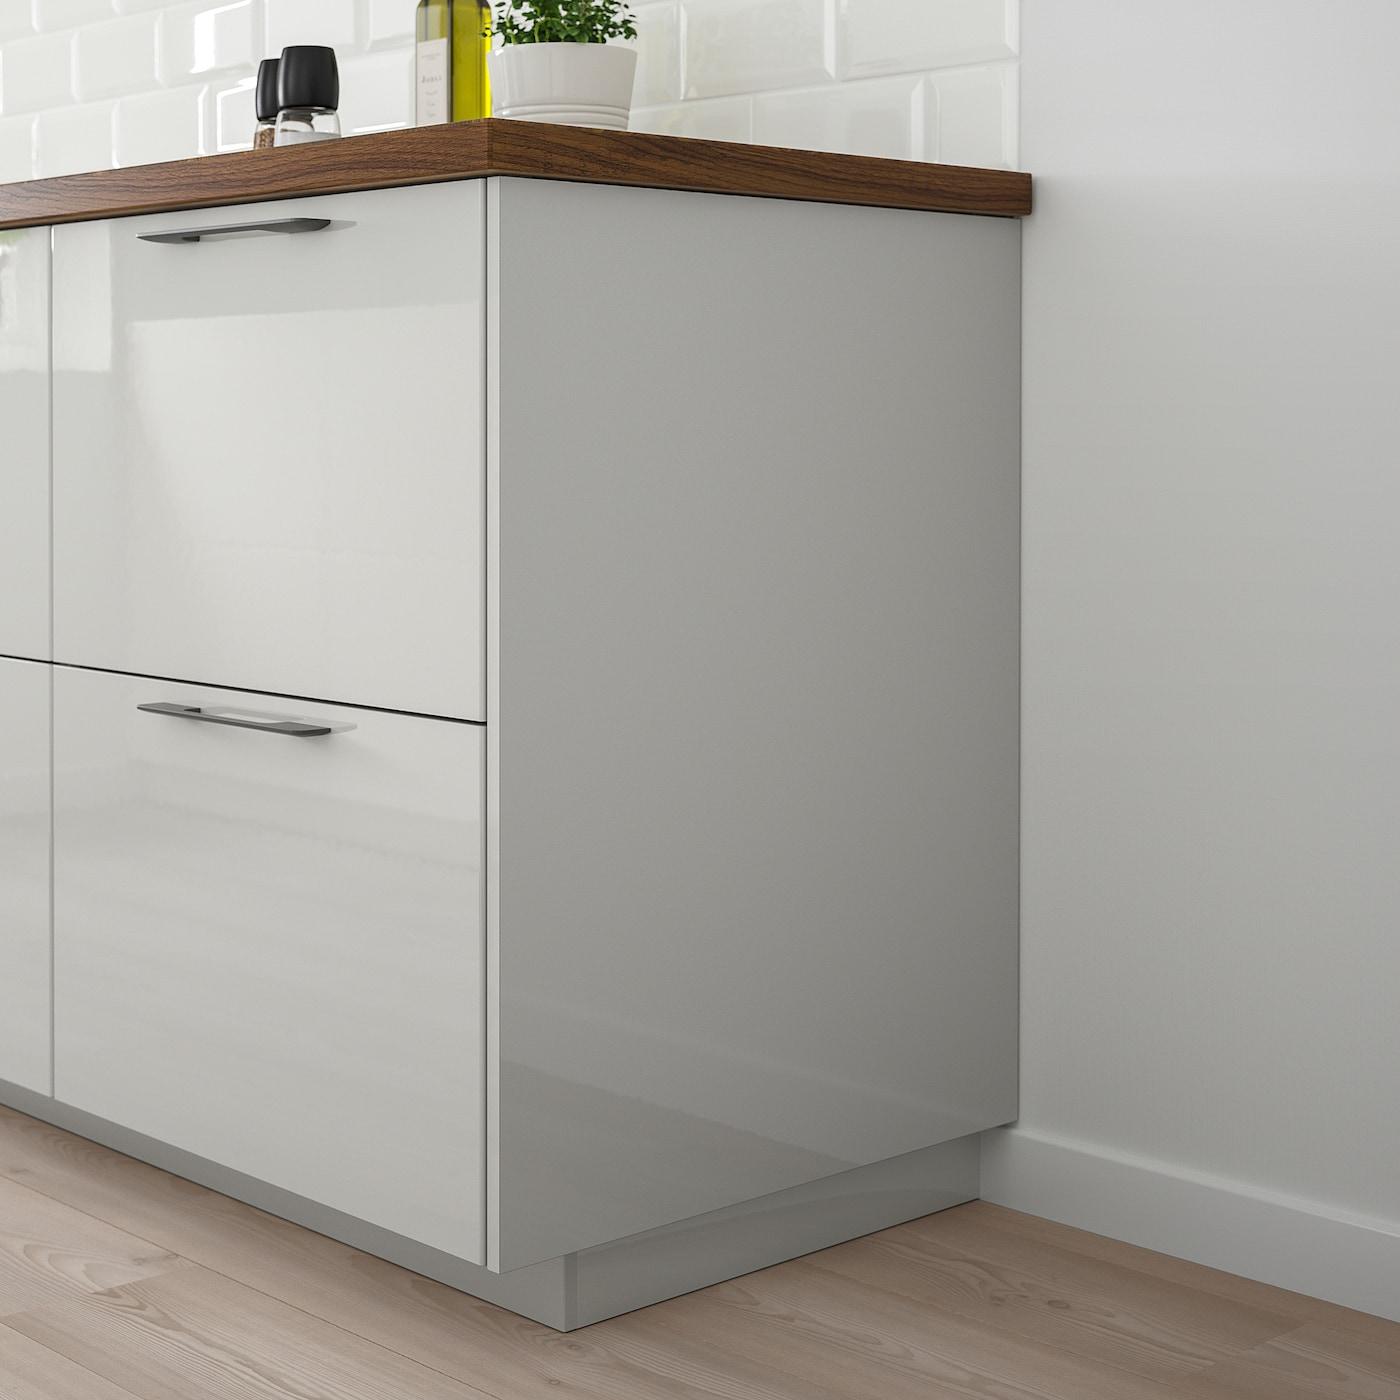 Ringhult Cover Panel High Gloss Light Grey 62x240 Cm Ikea